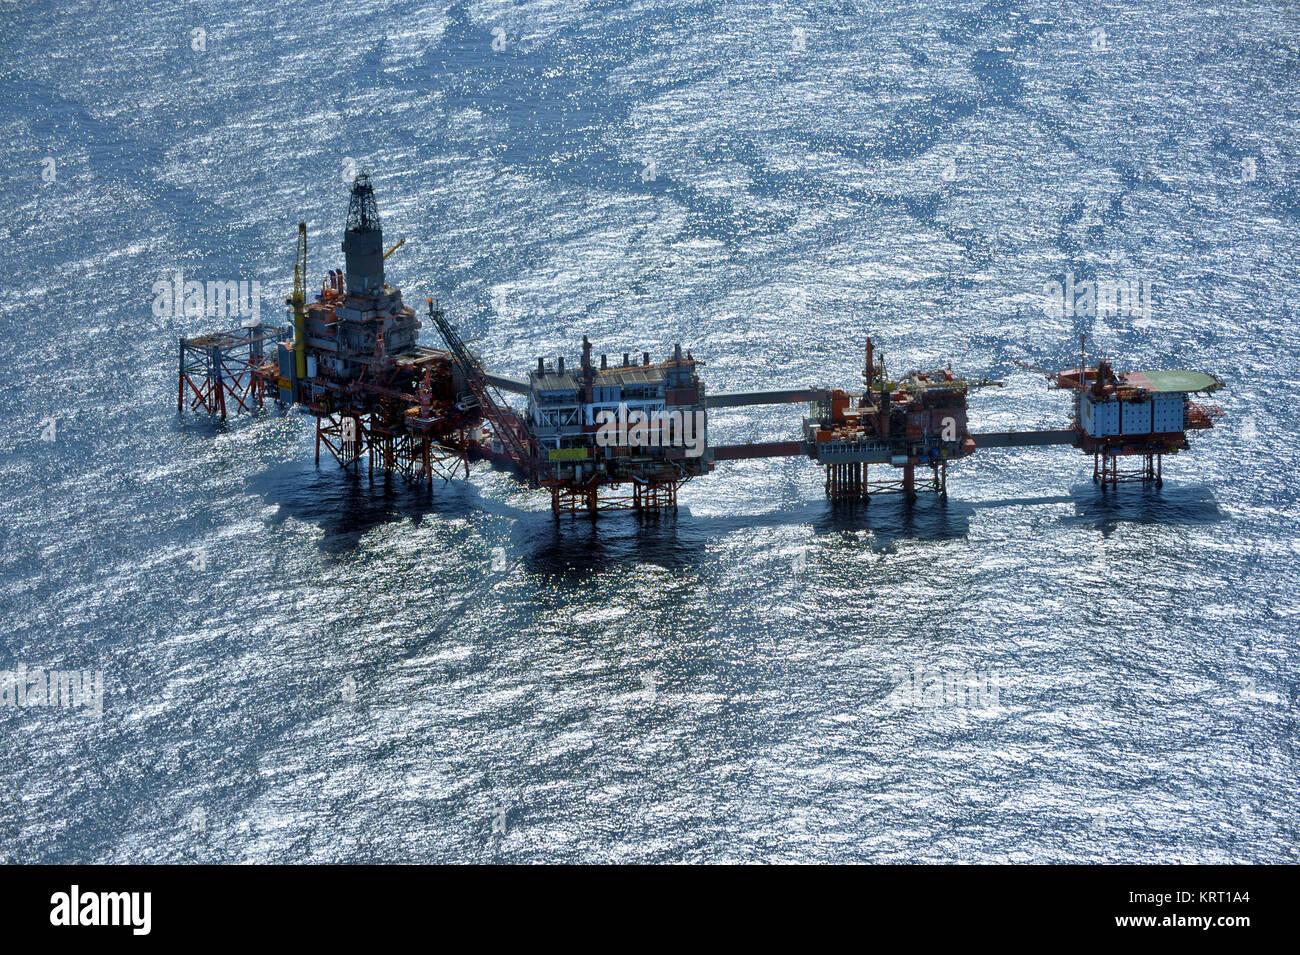 Nordsee, Öl Produktion mit Plattformen. Luftaufnahme. Ekofisk Station. Stockbild